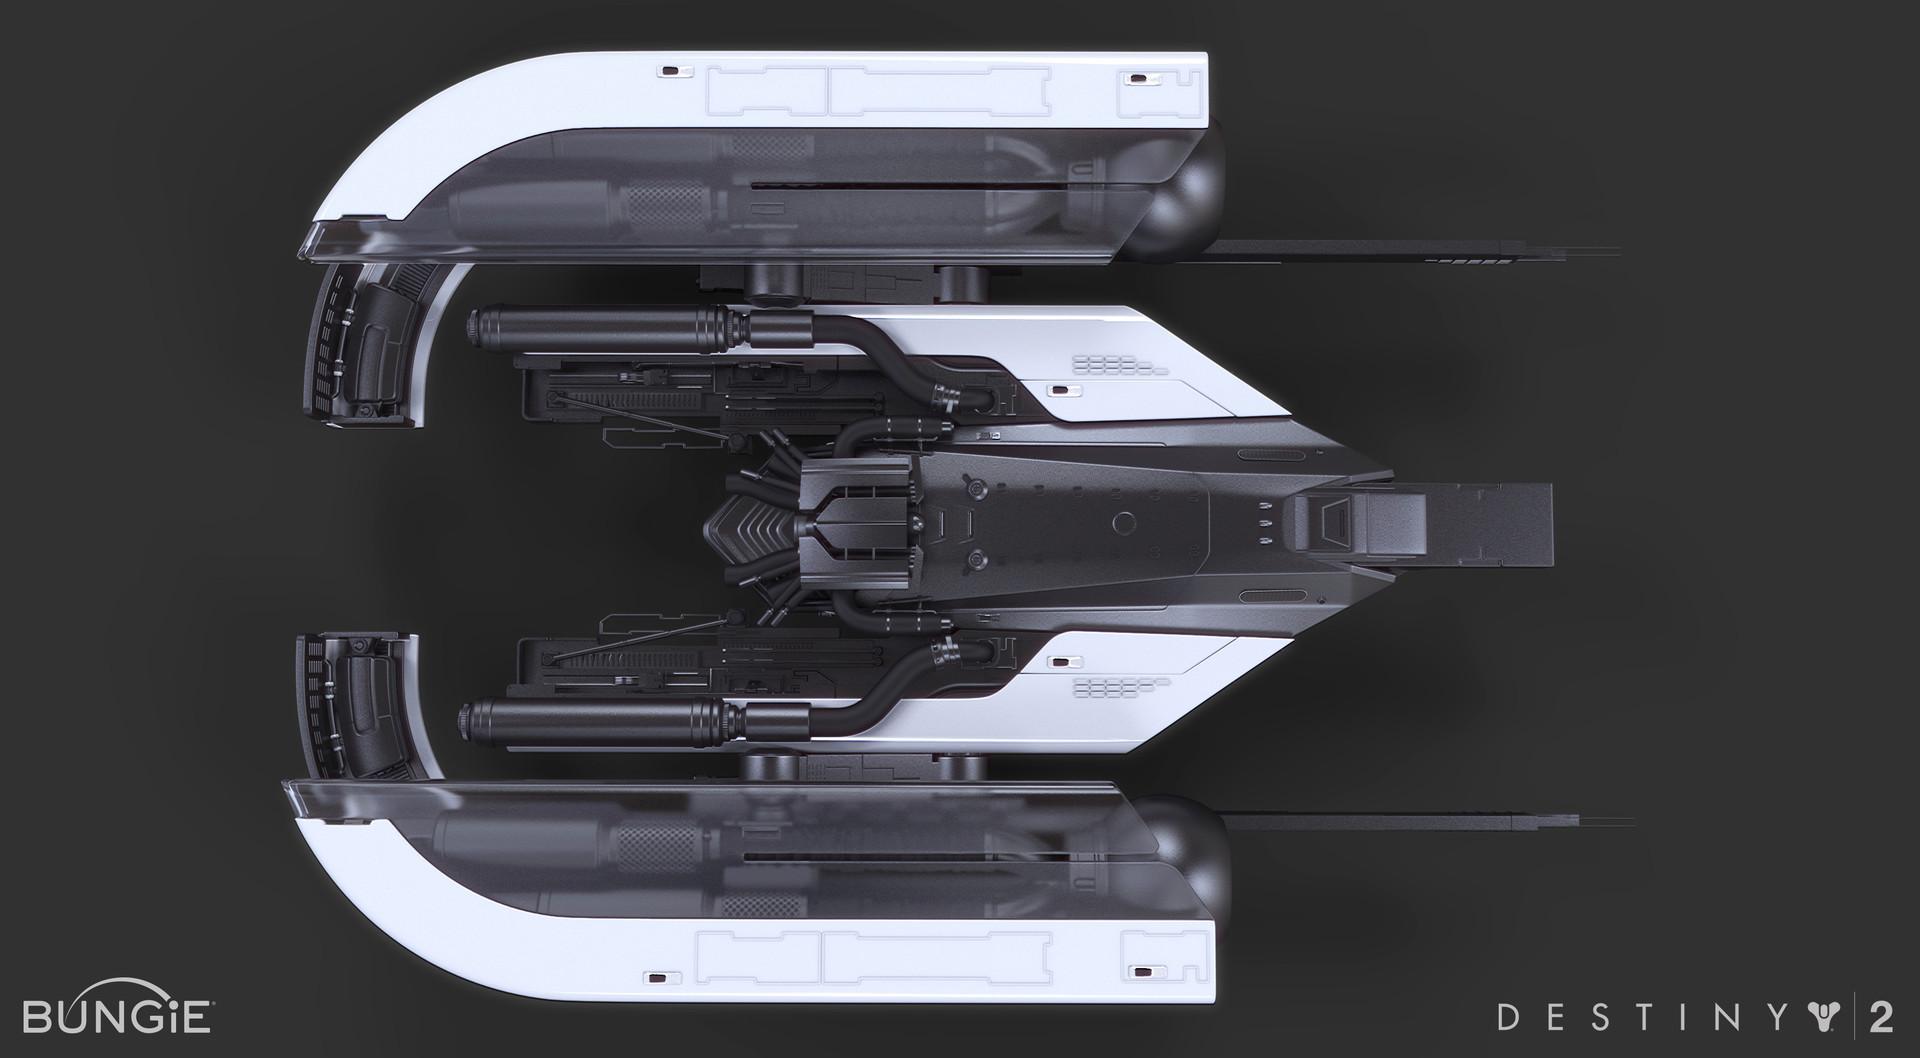 Mark van haitsma warship class wings b top